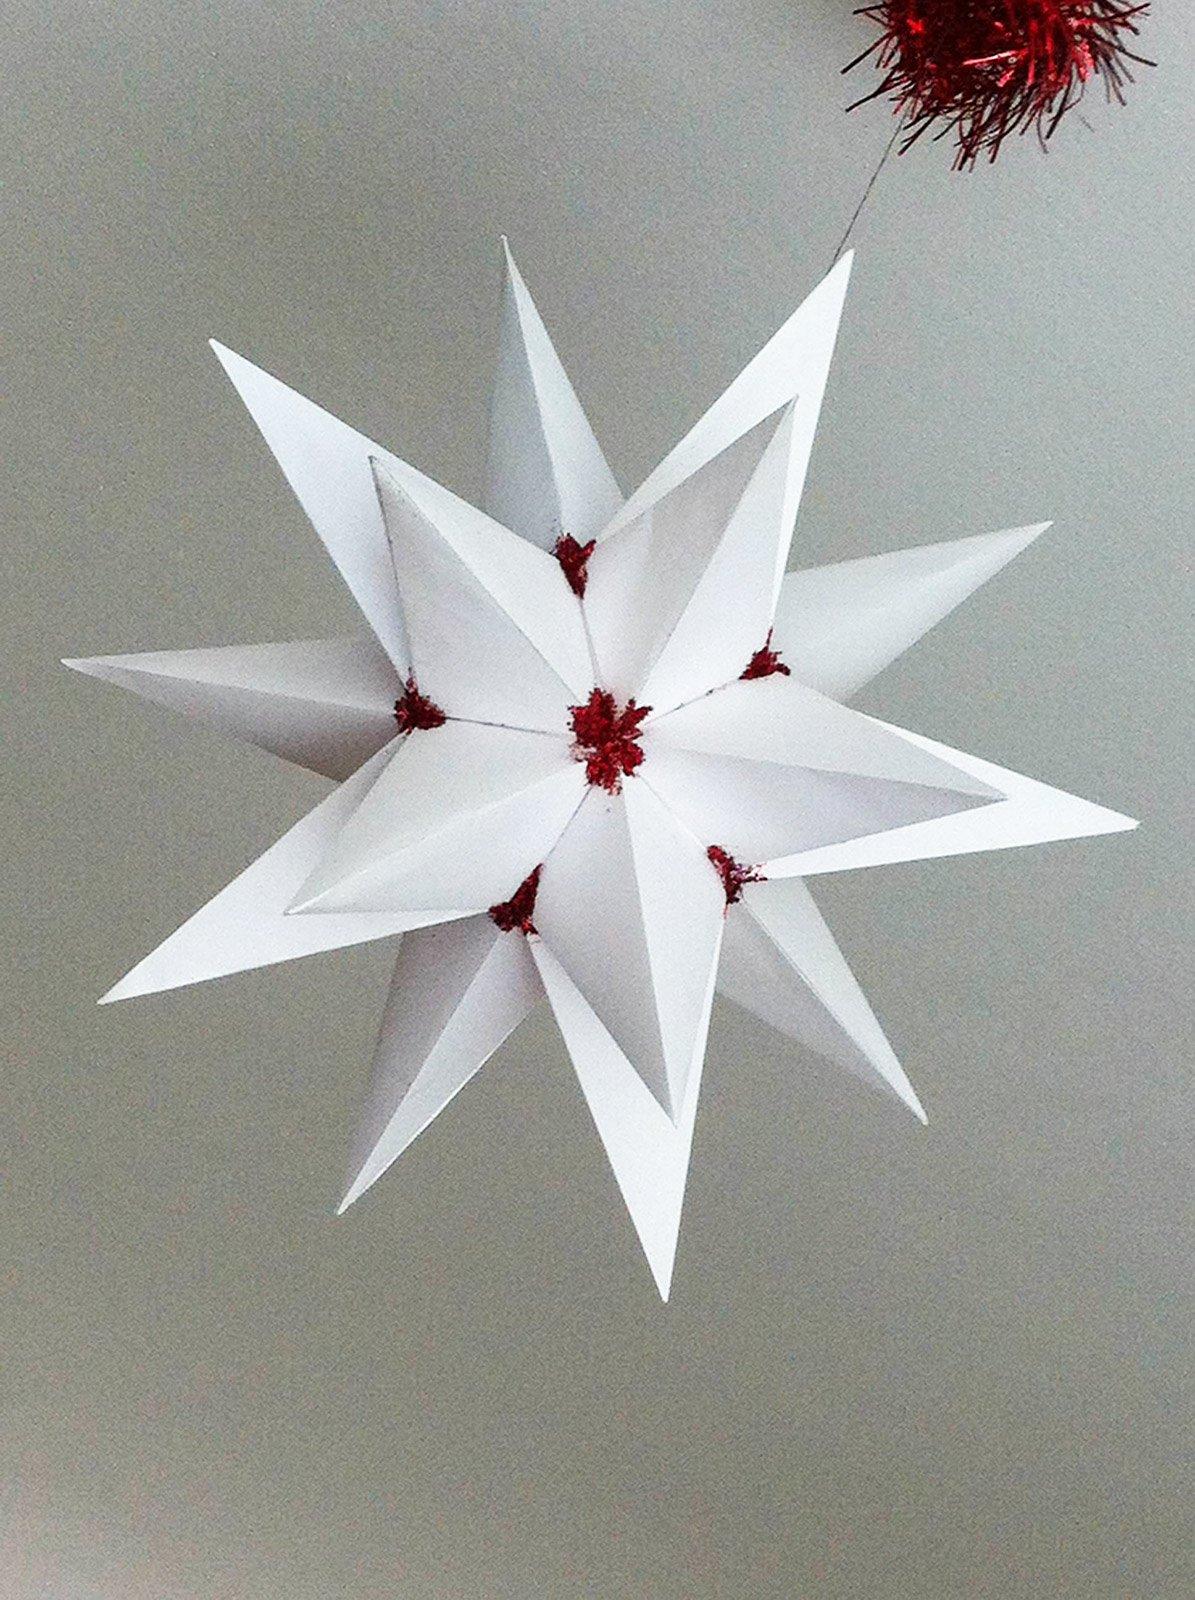 Popolare amelia-ghio-fai-da-te-stella-bianca - Cose di Casa II46